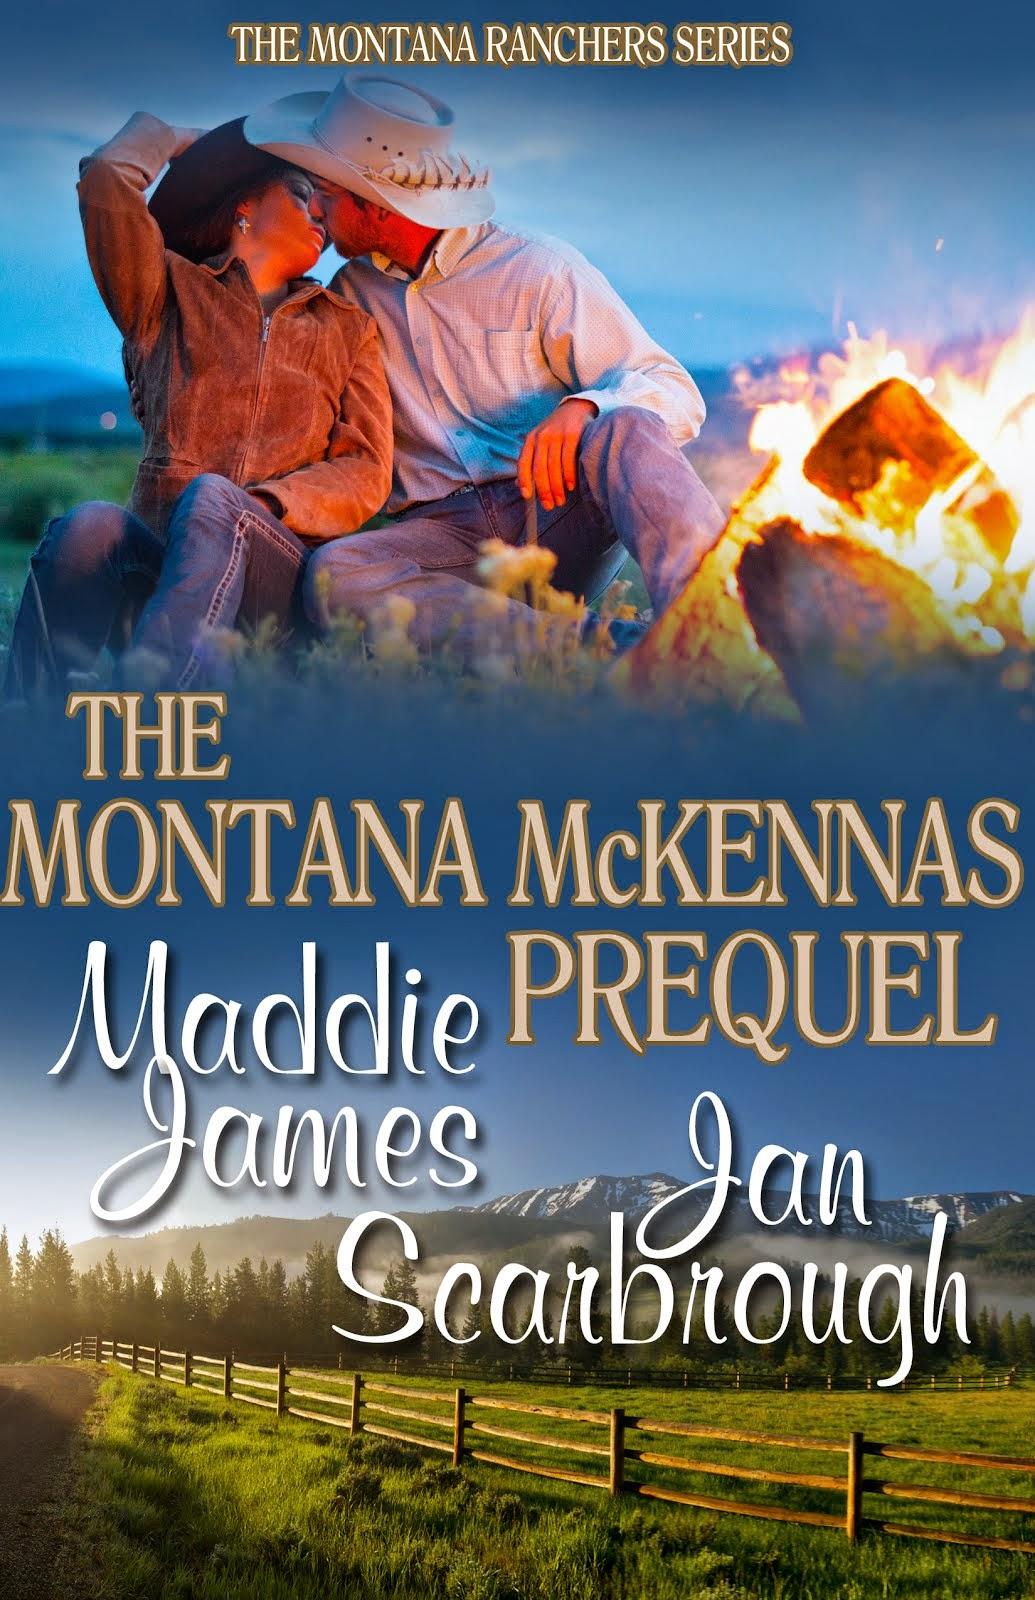 The Montana McKennas Prequel